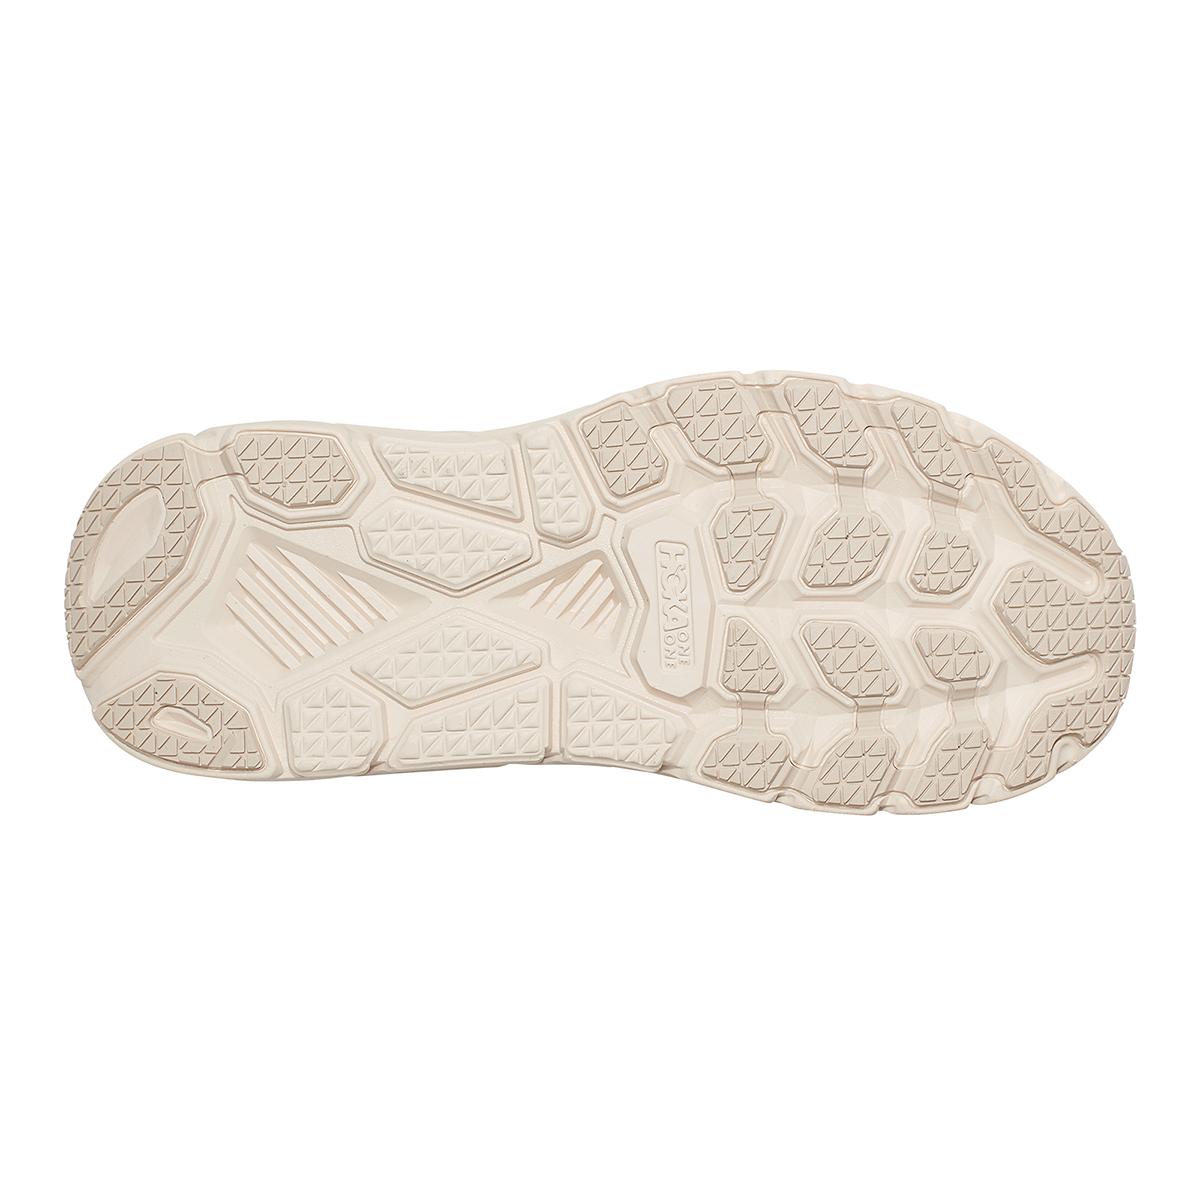 Women's Hoka One One Clifton 7 Running Shoe - Color: Almond Milk/Bronze - Size: 5 - Width: Regular, Almond Milk/Bronze, large, image 6